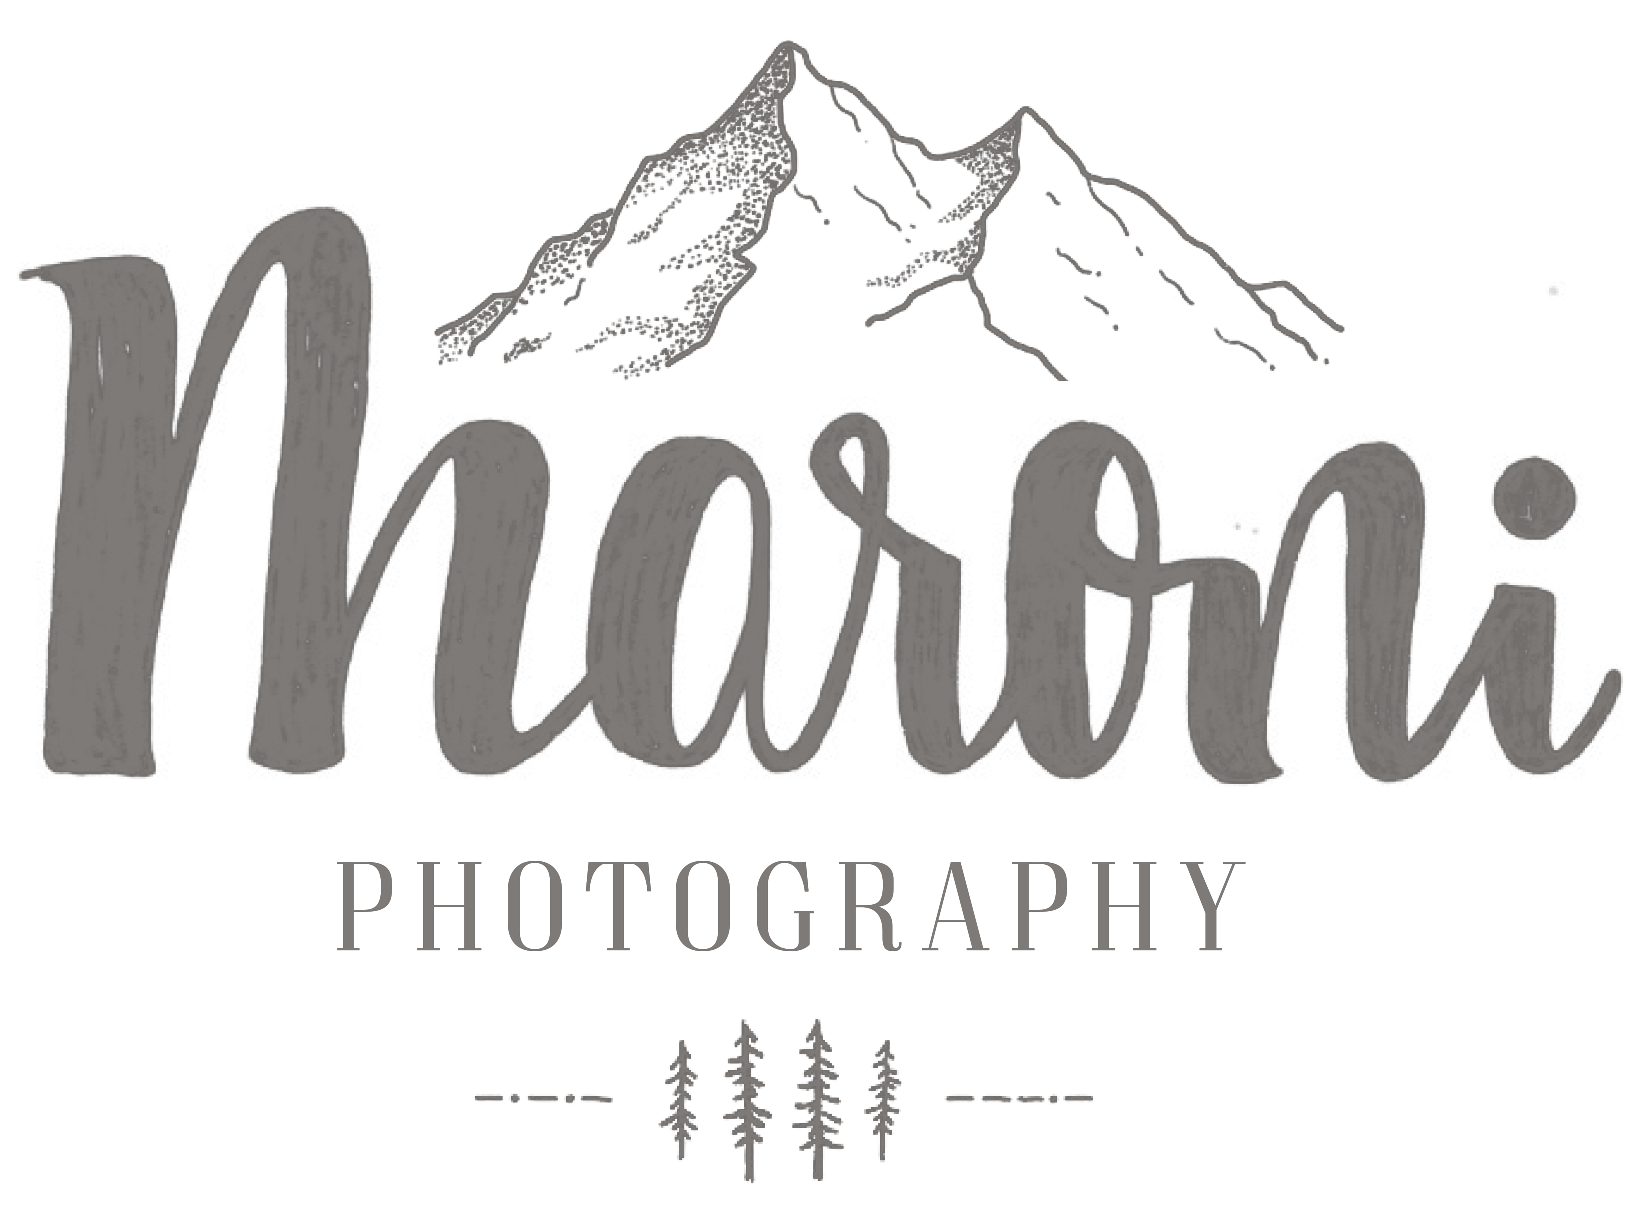 Maroni Photography